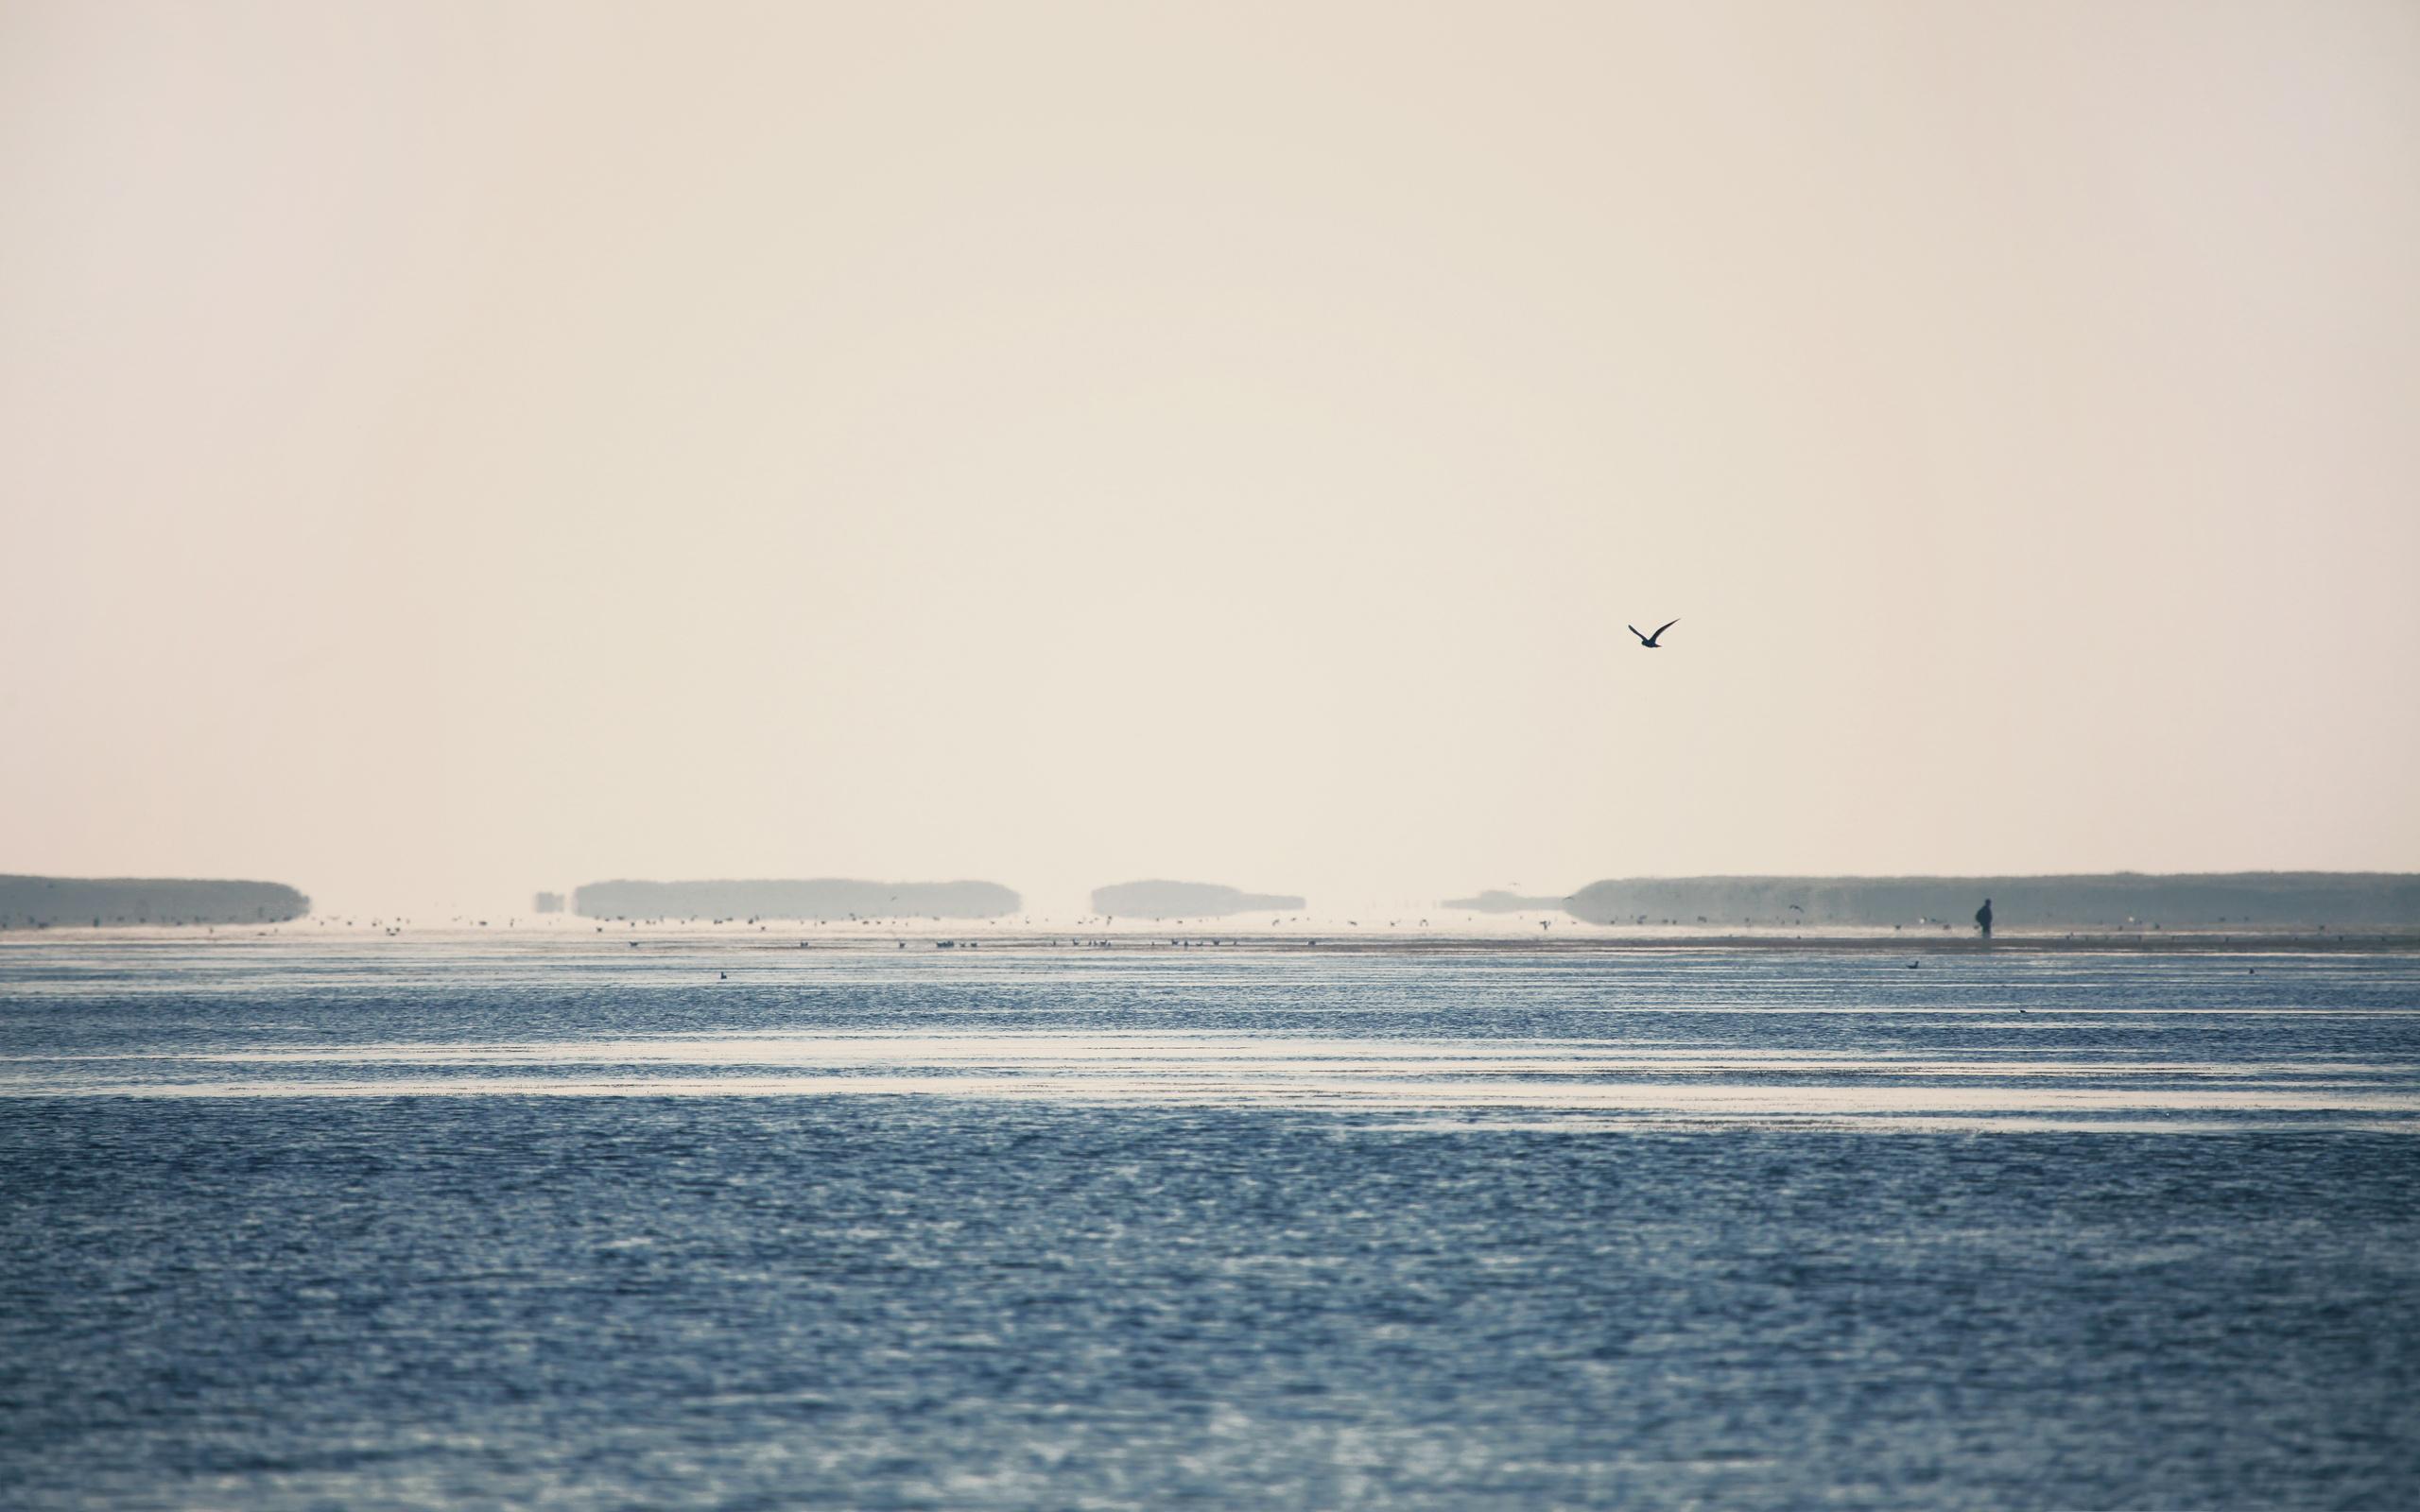 Sea morning birds